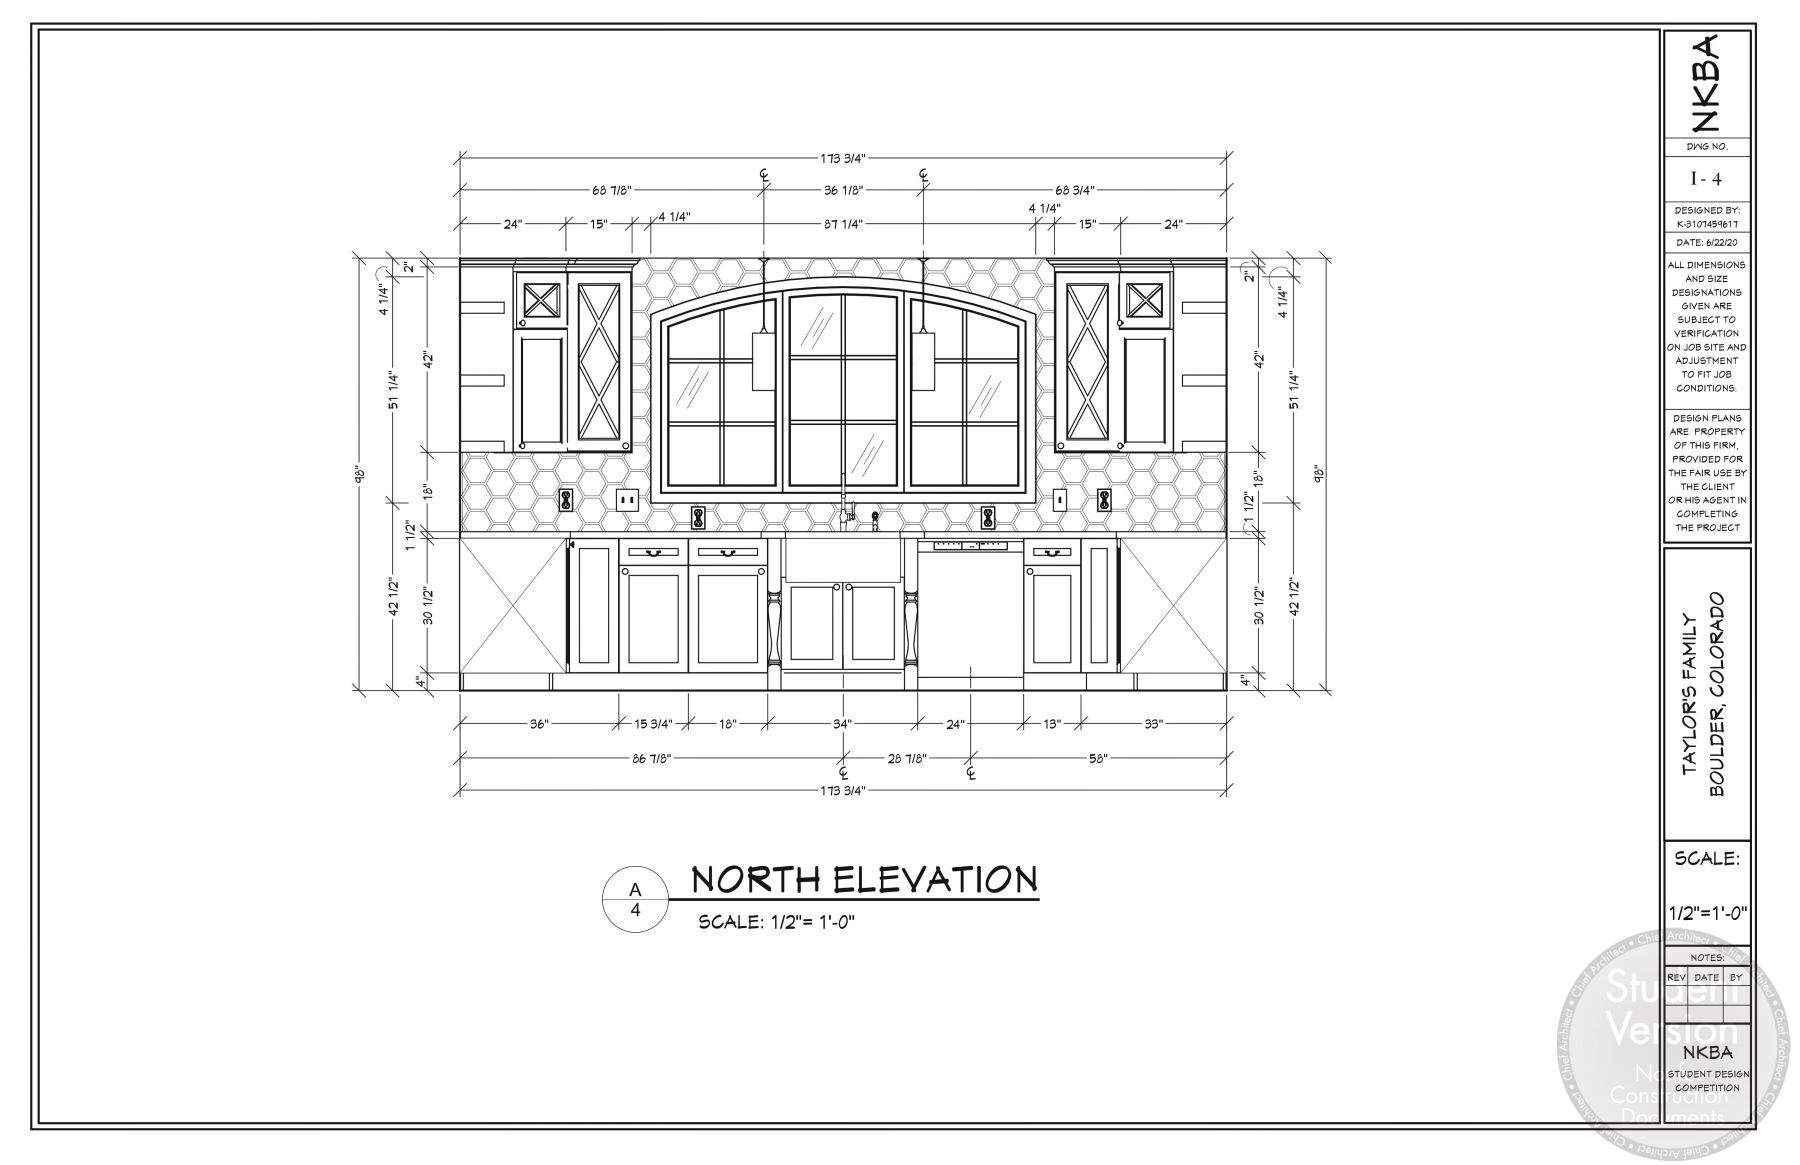 North elevation view